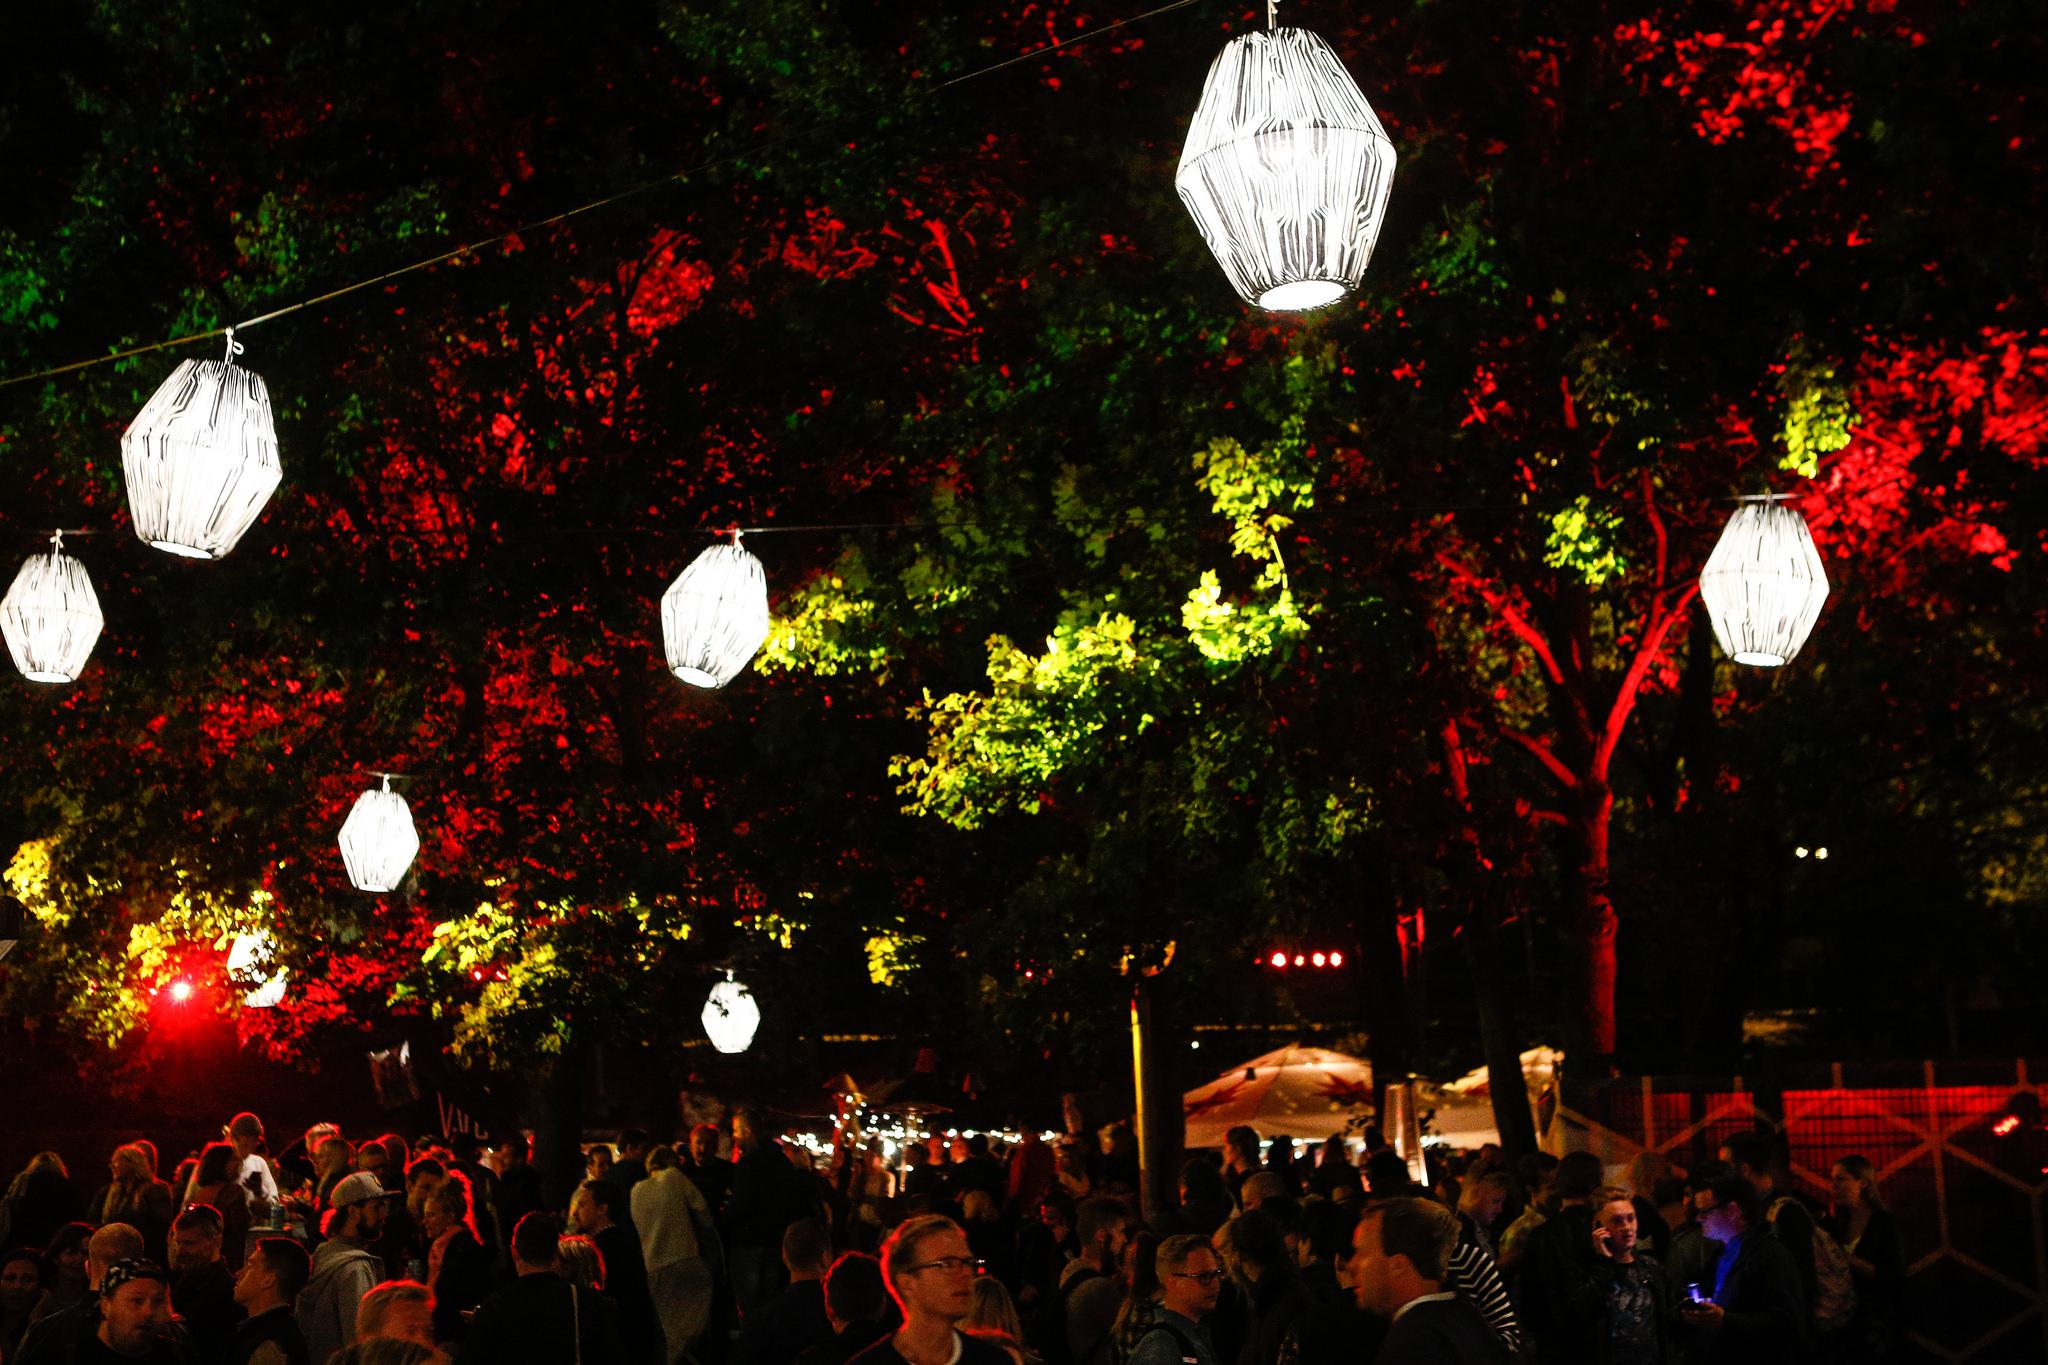 Nicely lit summer evening at Flow Festival